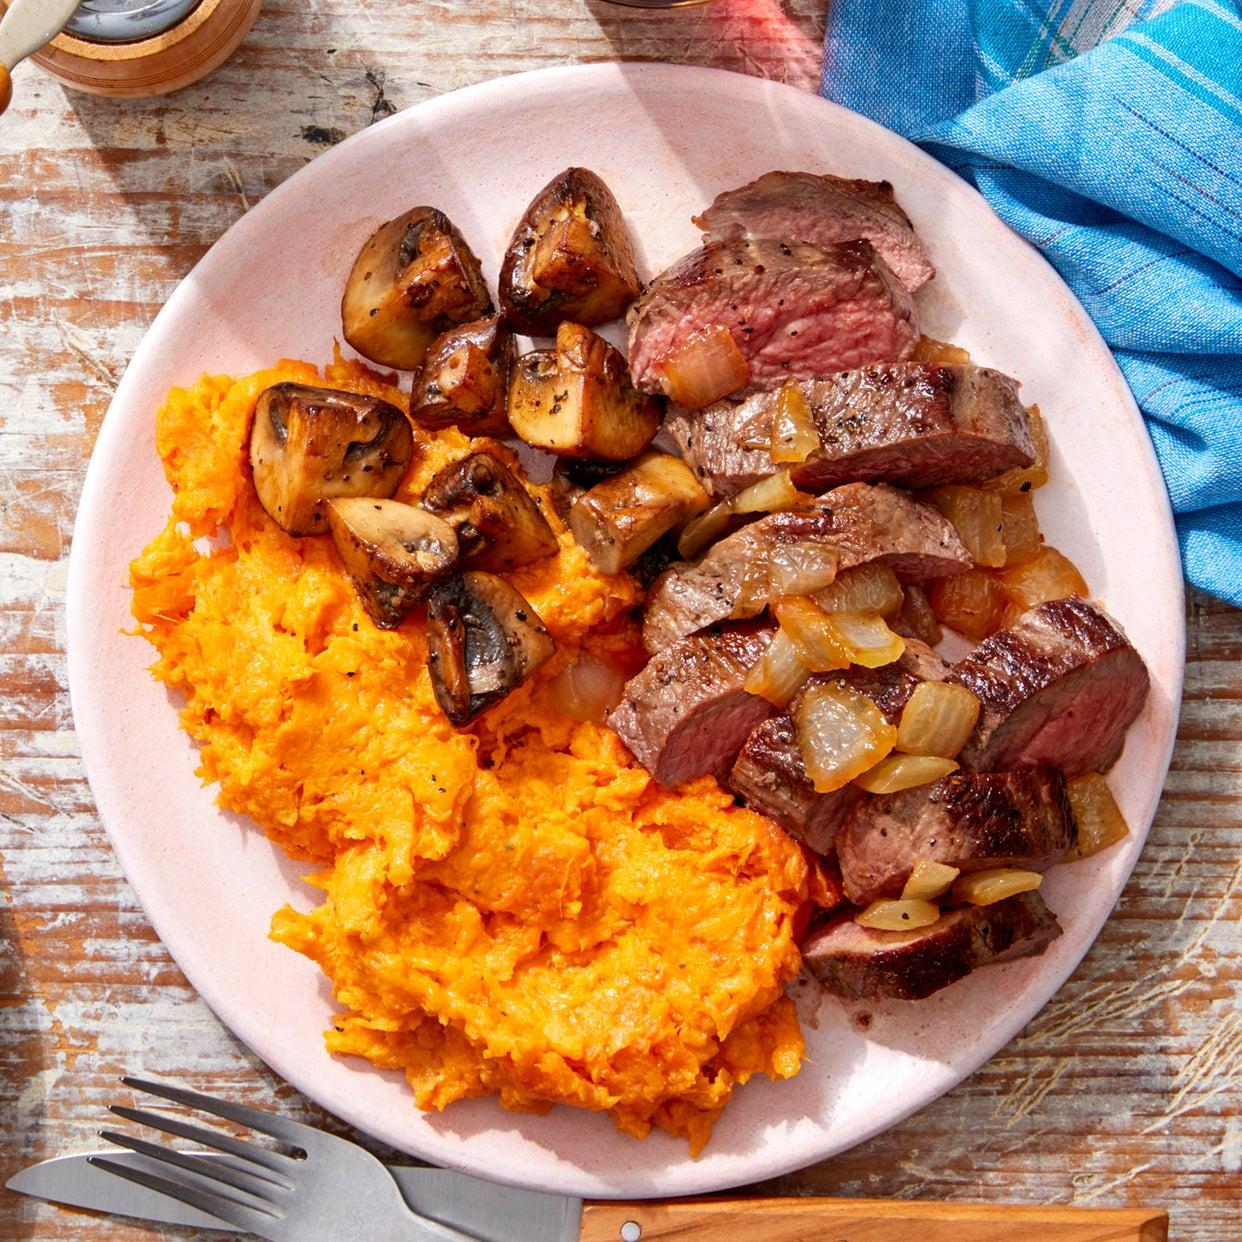 MasterChef Seared Steaks & Cheesy Mashed Sweet Potatoes with Cremini Mushrooms & Caramelized Onion